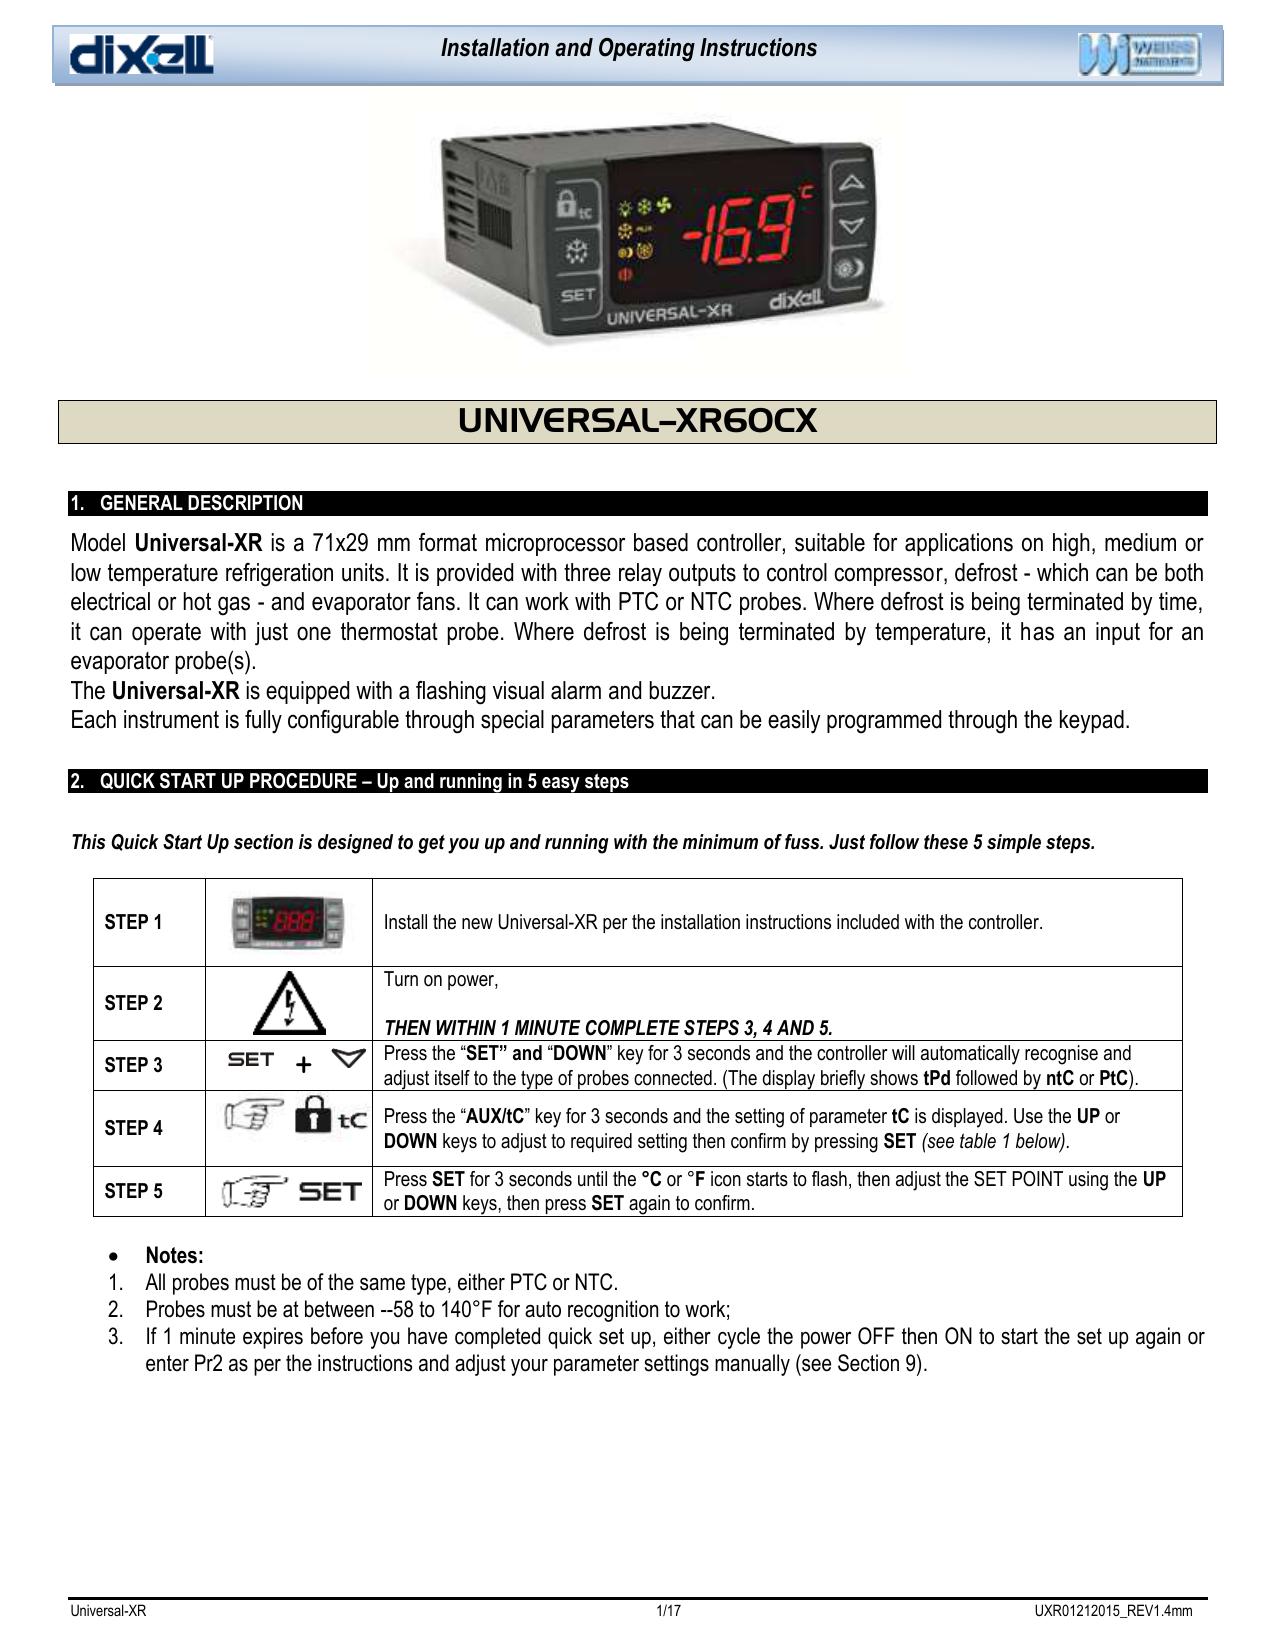 Dixell Universal R Installing Amp Manualzz